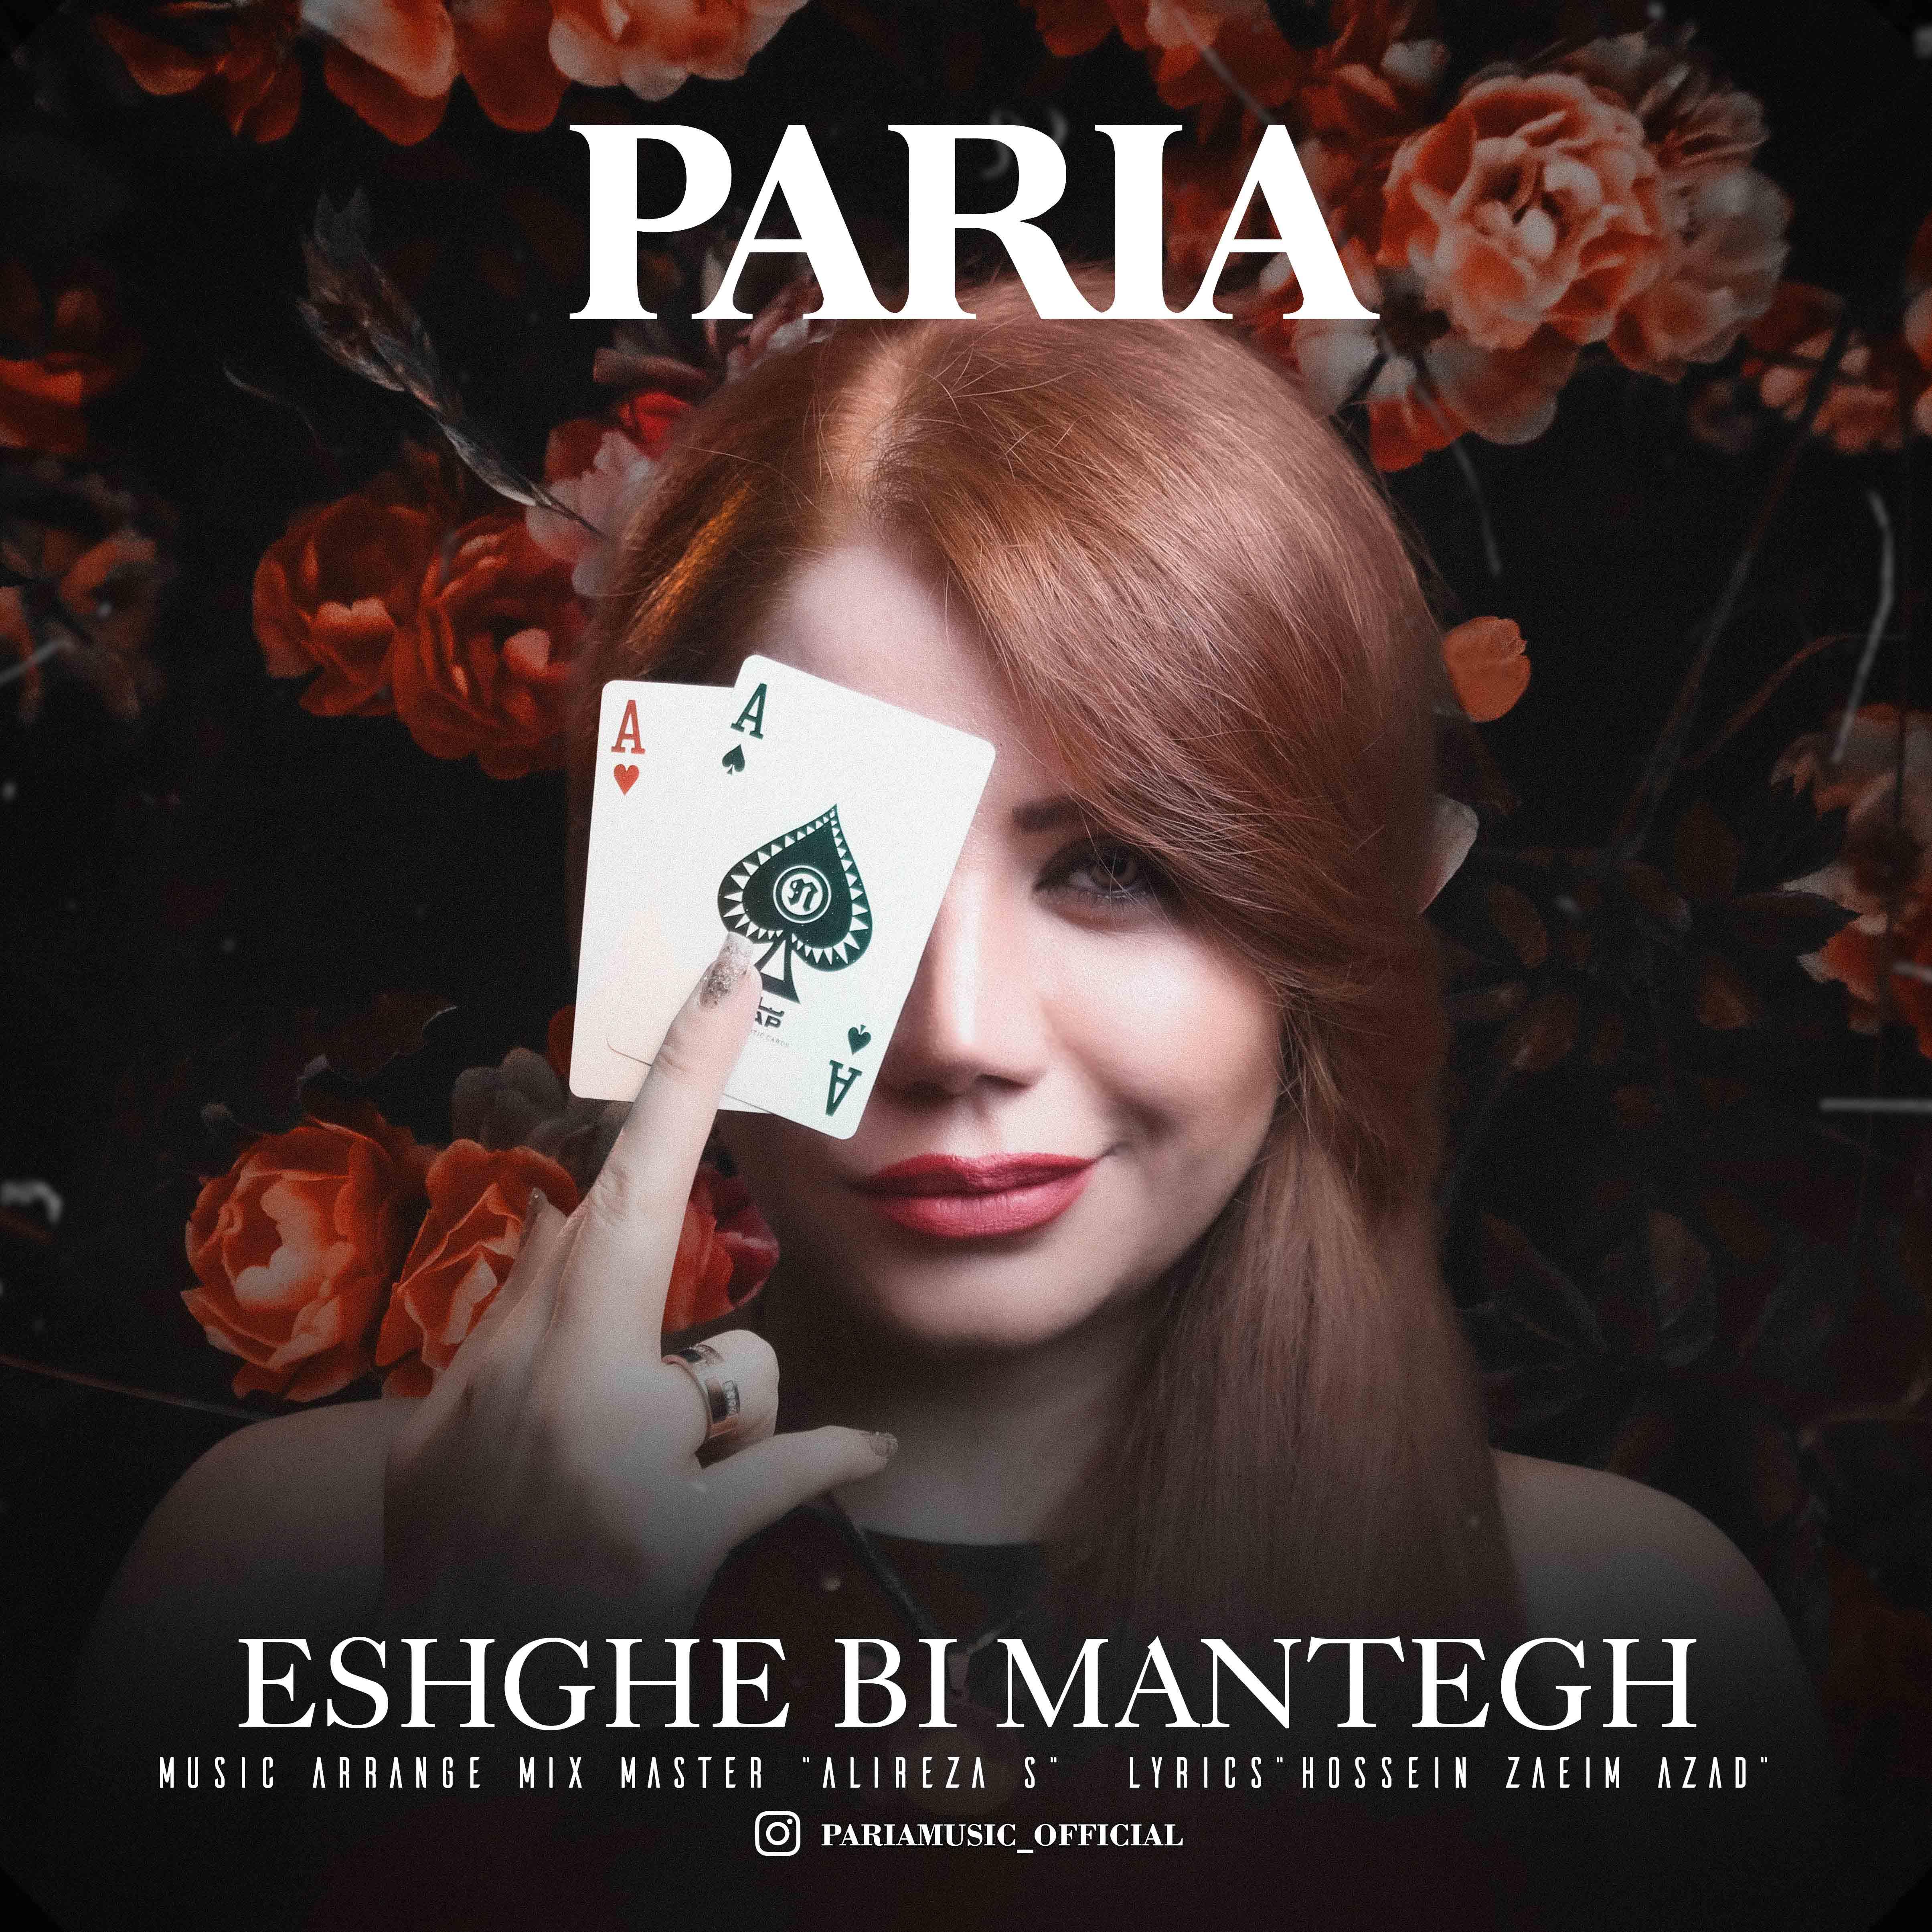 Paria - Eshghe Bi Mantegh